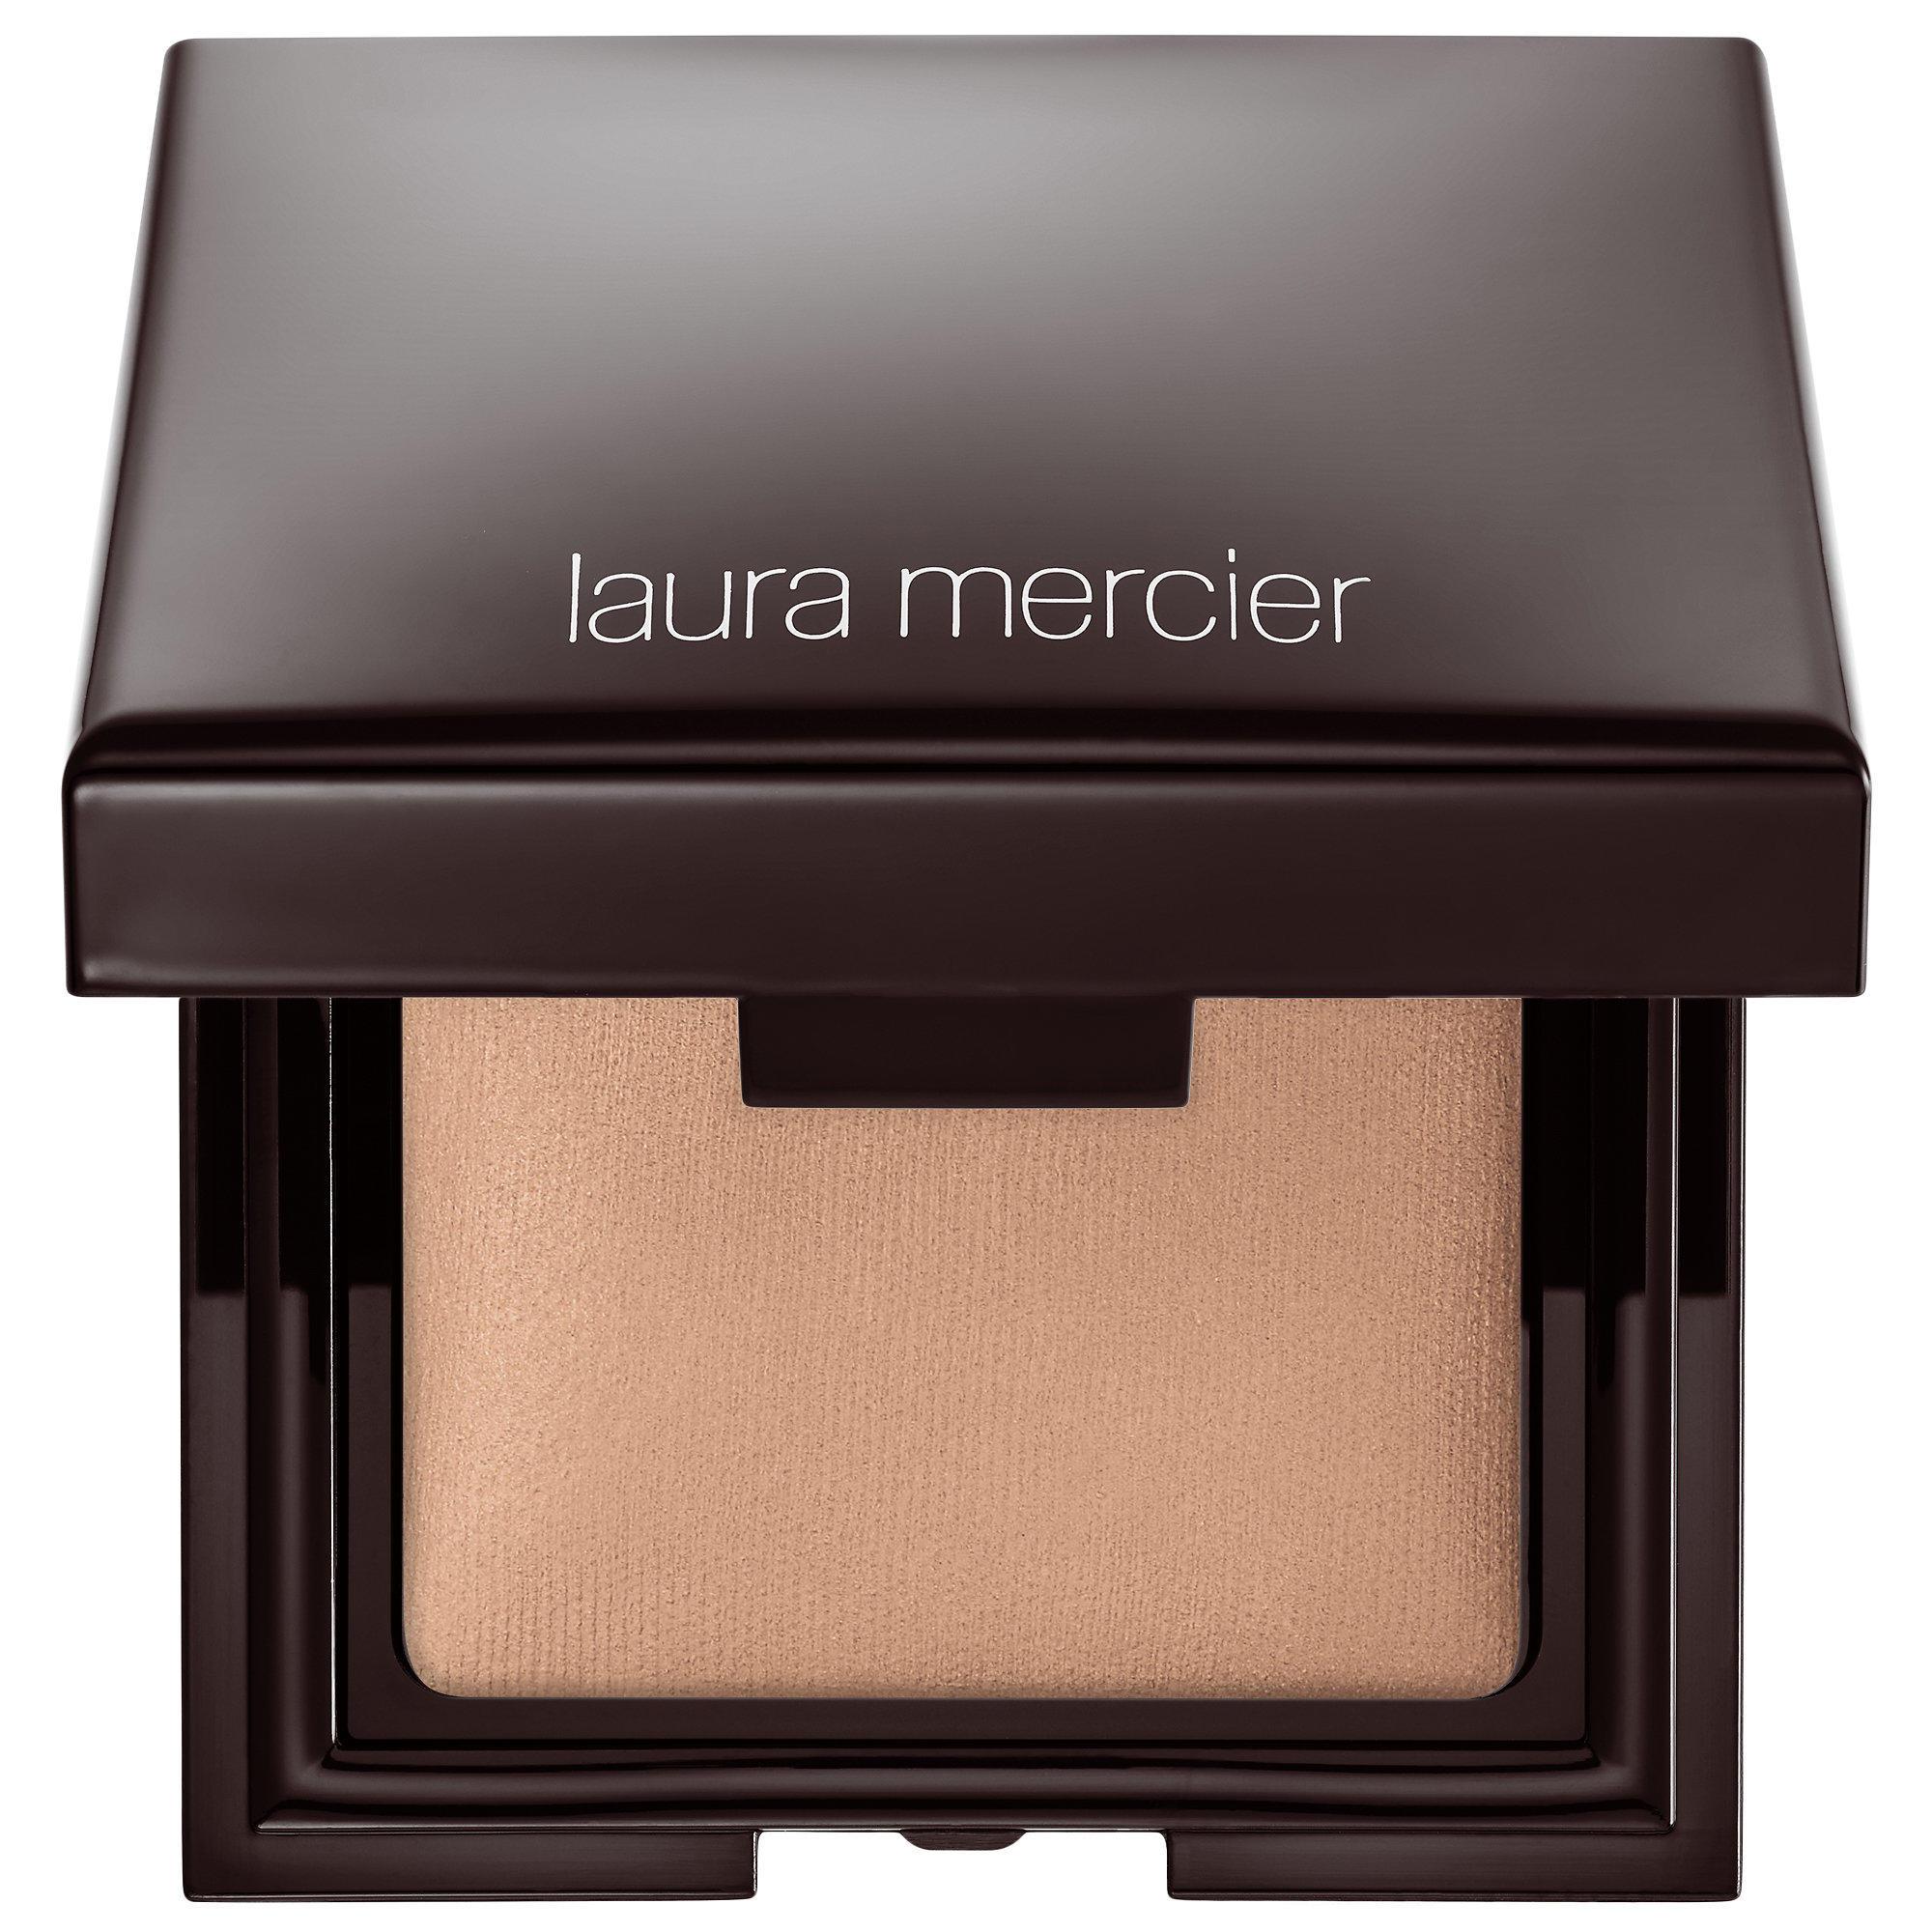 Laura Mercier Candleglow Sheer Perfecting Powder Light Medium 3